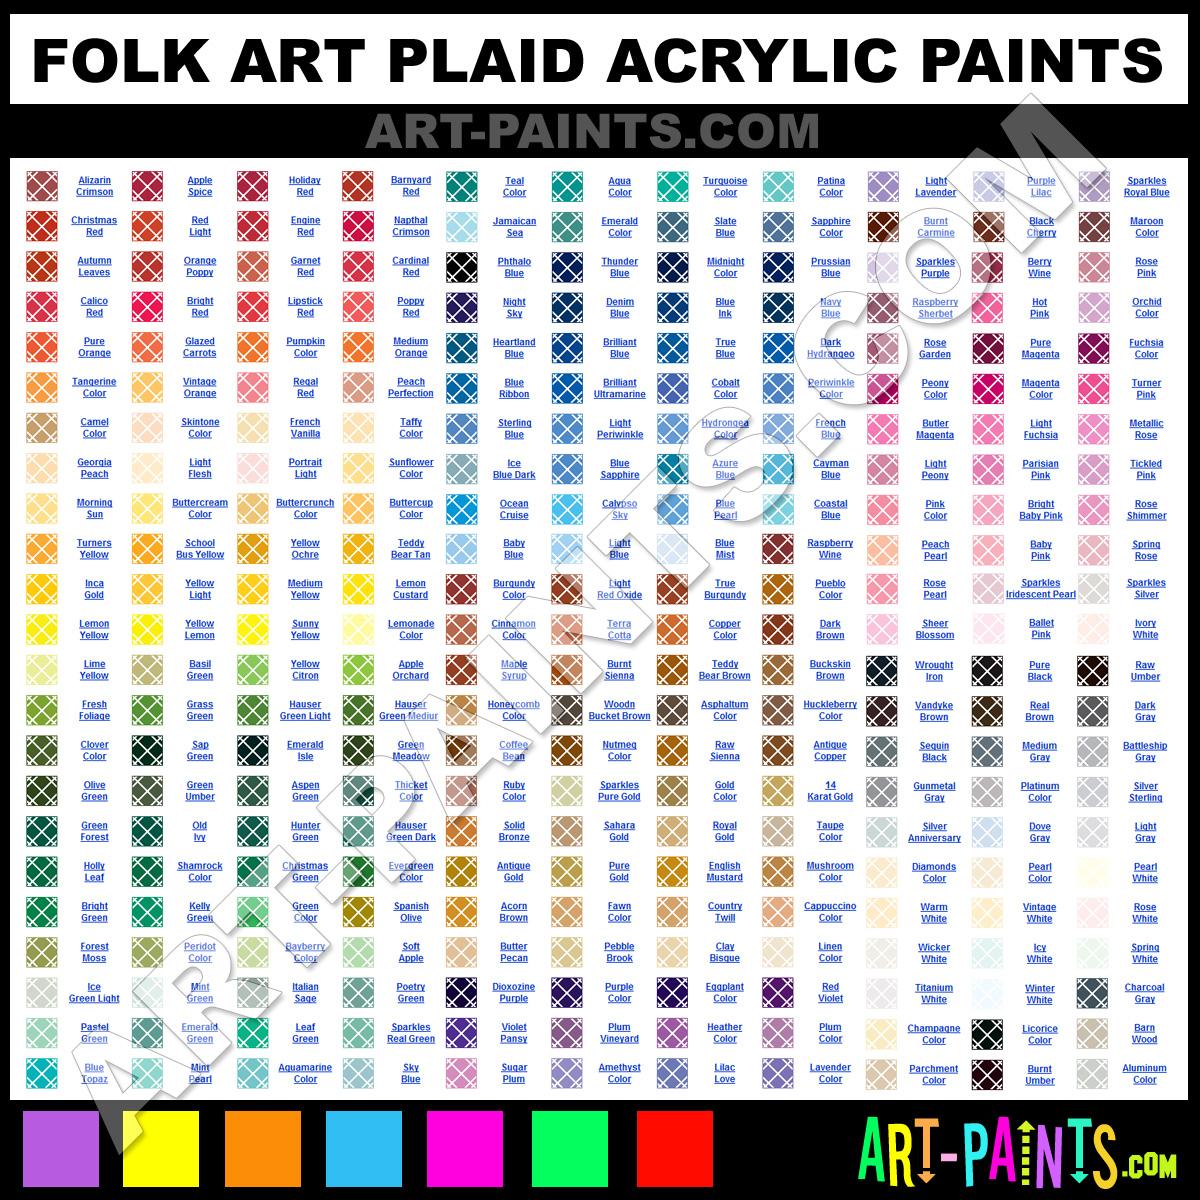 Folk Art Plaid Acrylic Paint Colors - Folk Art Plaid Paint Colors, Plaid Color, Plaid Acrylics ...